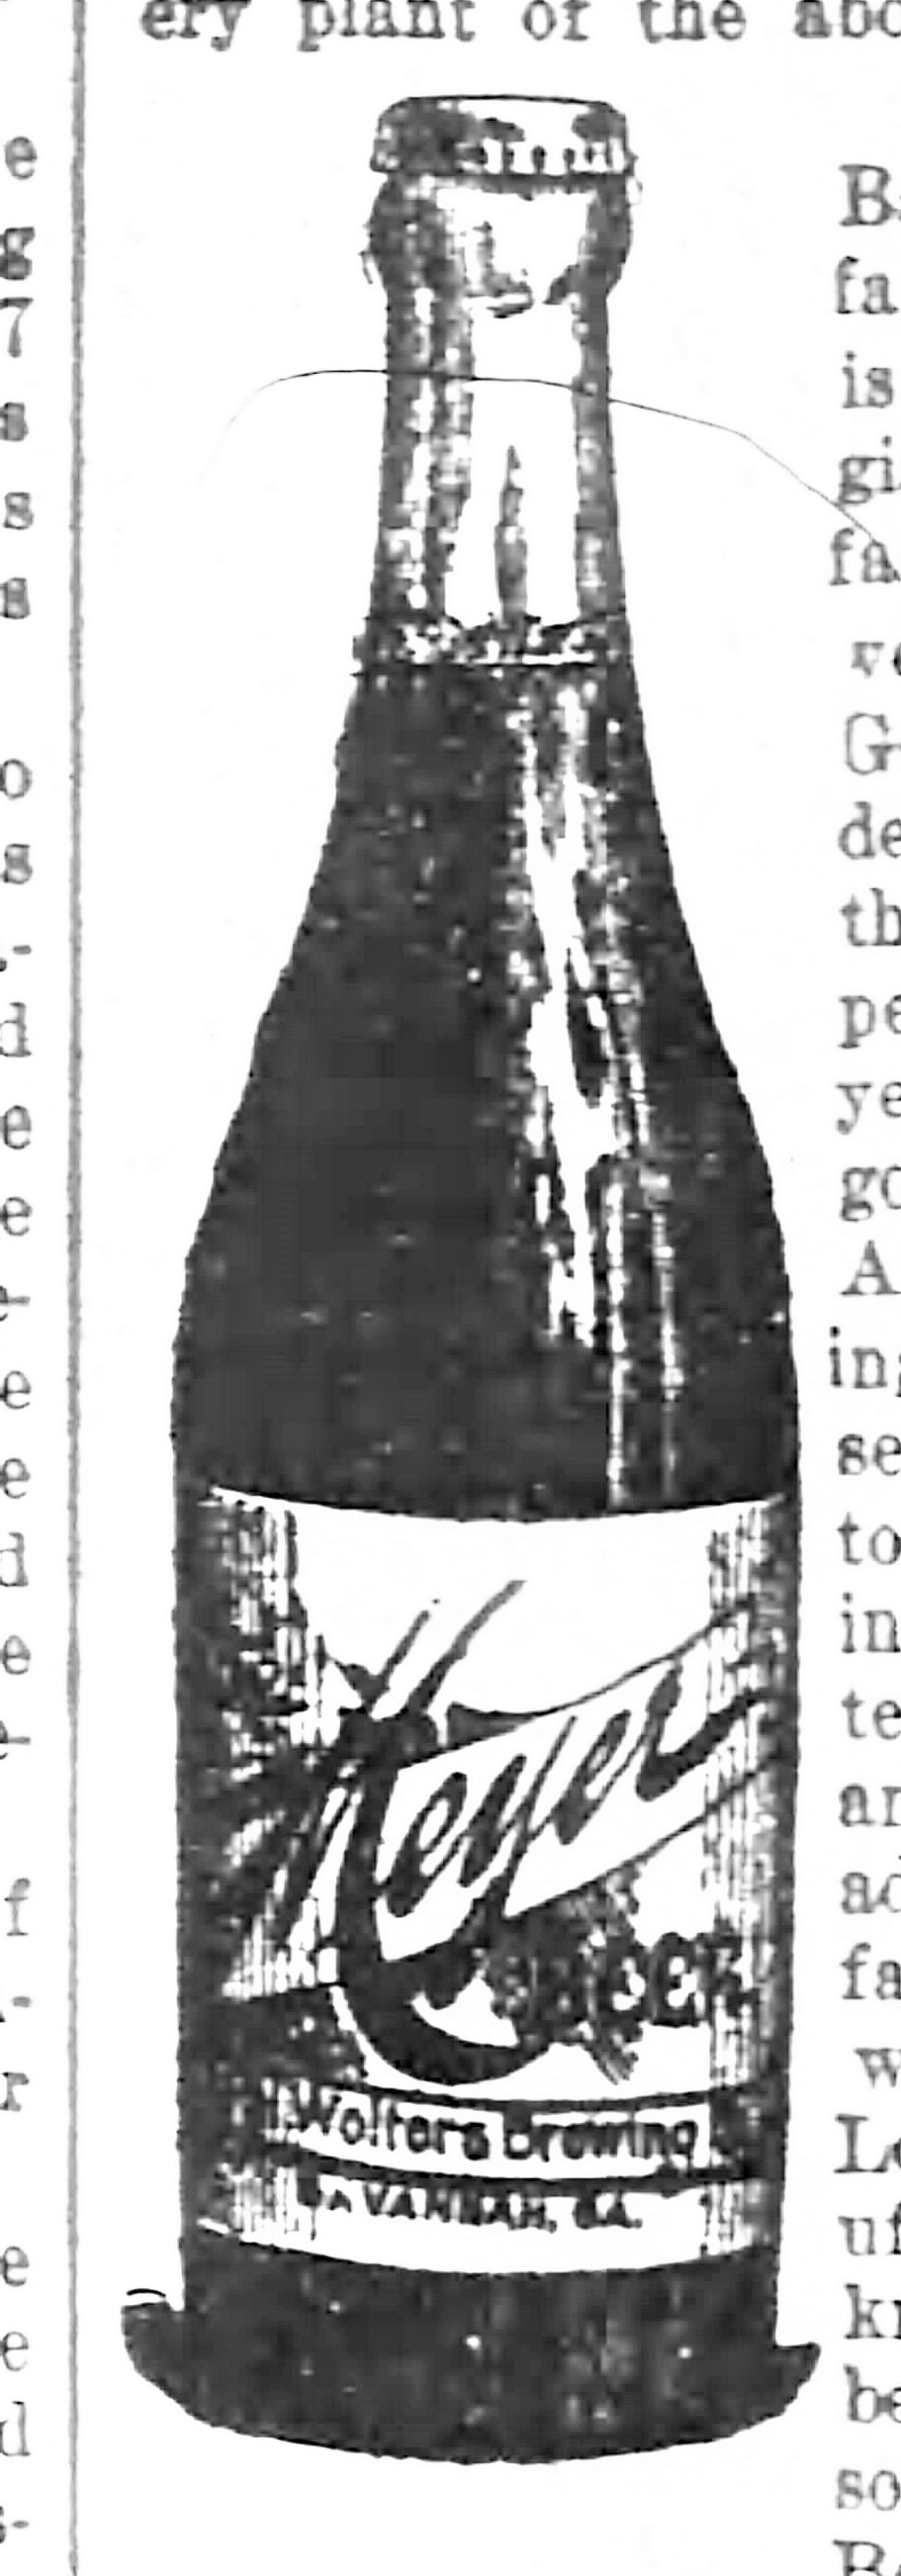 Meyer Crown Cork Bottle_The_Atlanta_Constitution_Georgia_Sun__Apr_30__1893_Cropped.jpg